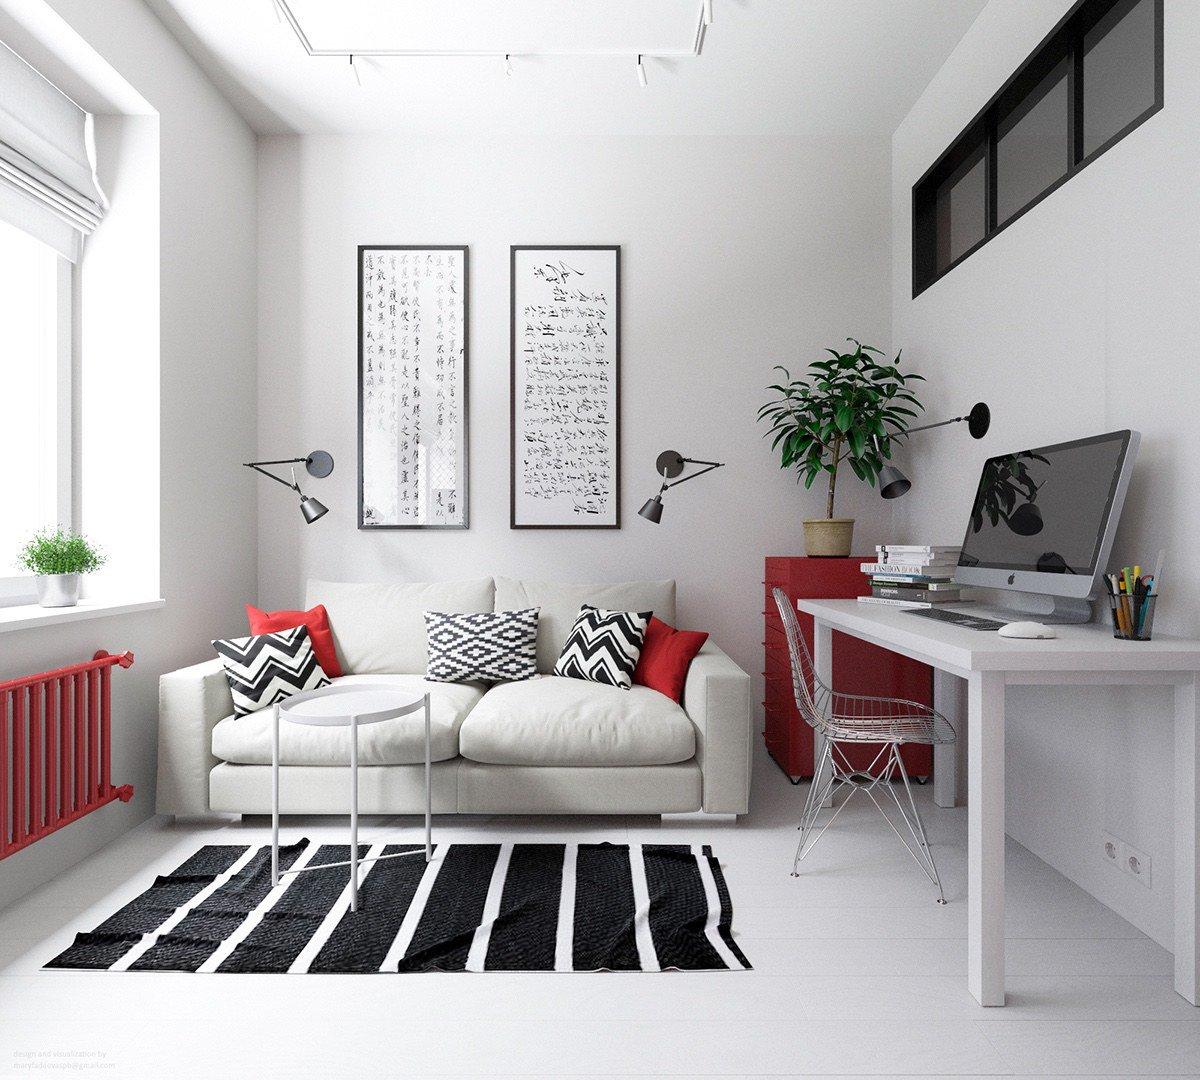 Picking the Living Room Color Schemes  More information here http:// teresasdesk.com/picking-the-li ving-room-color-schemes/ &nbsp; …   #decor #home #shower #ideas #room  #interior #interiordesign #homedecor #homedesign #homestyle #Design #amazing<br>http://pic.twitter.com/Ss4SRLlkXb